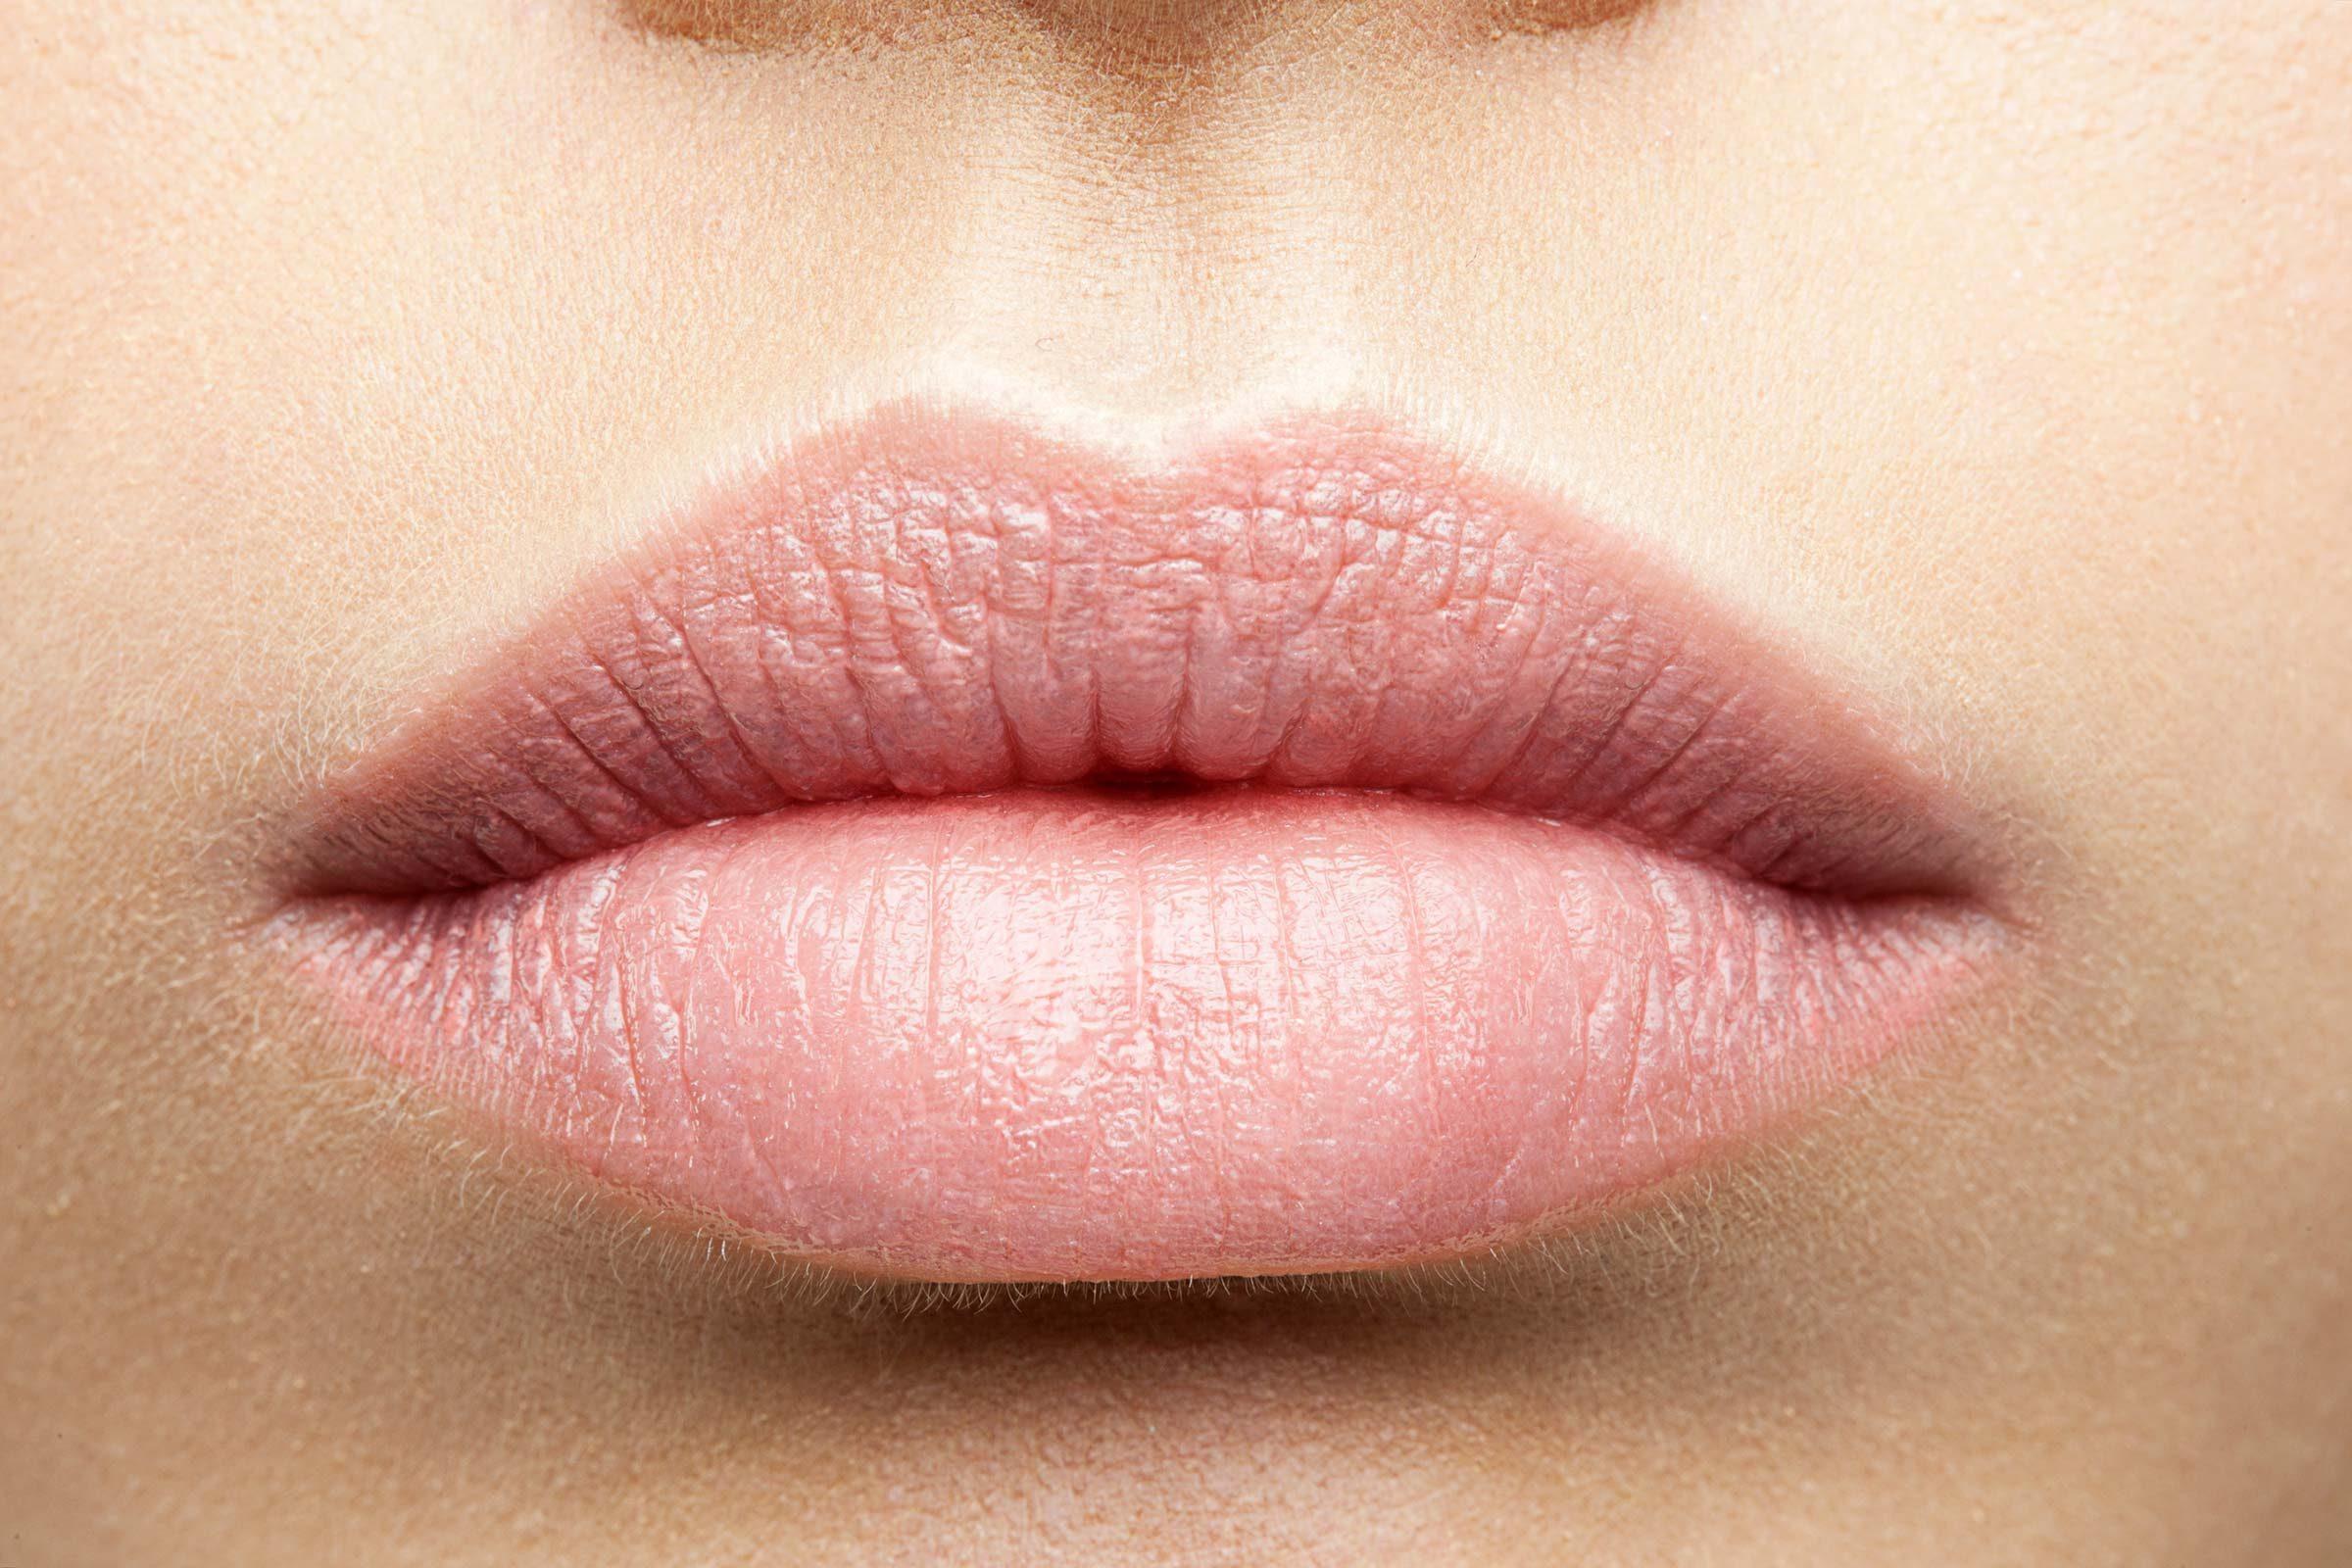 Canker Sore On Lower Lip